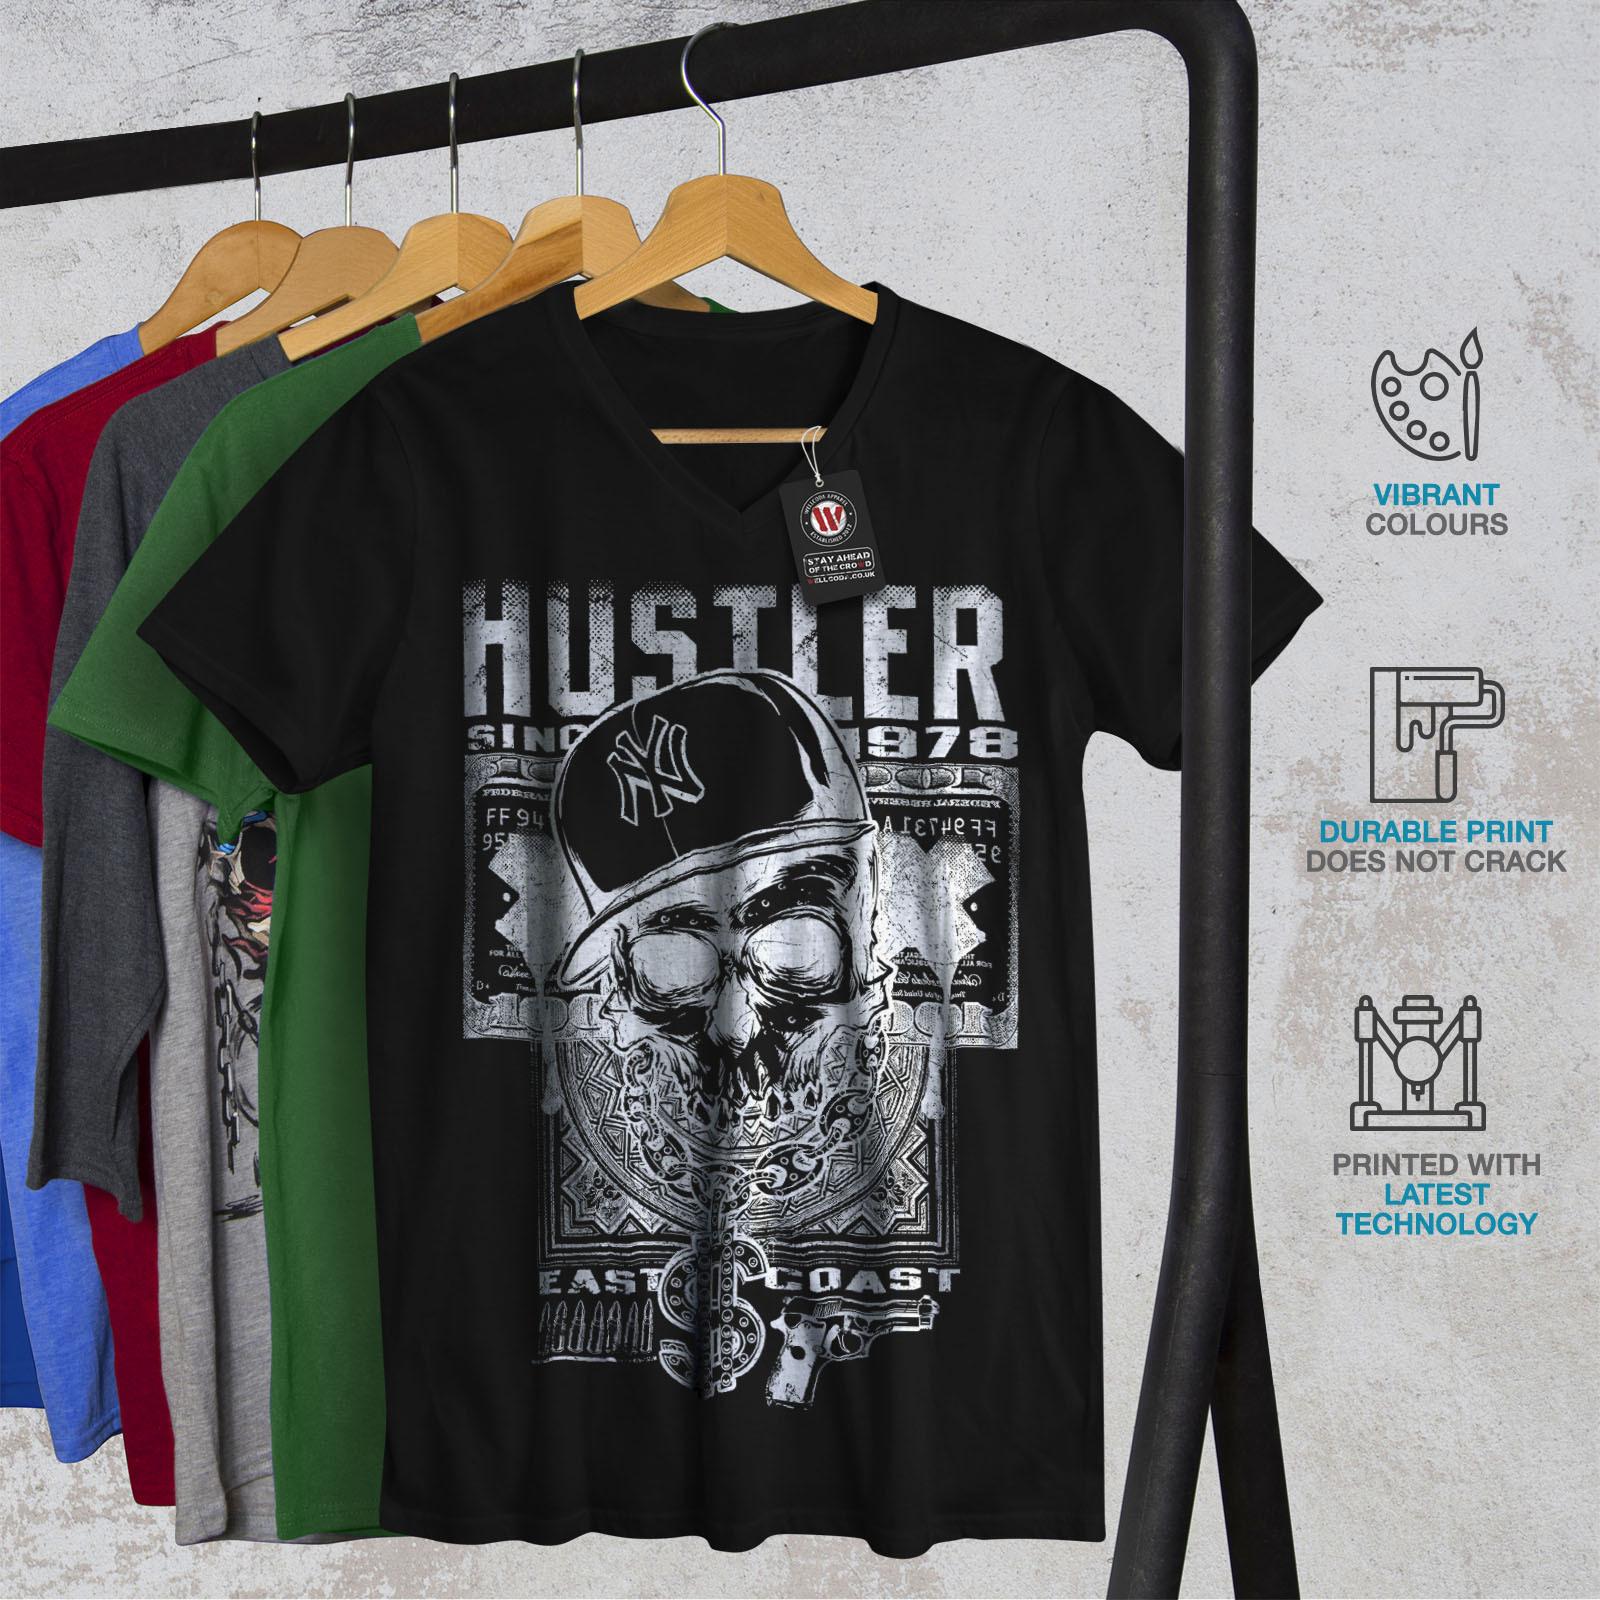 100 Cotton Knitted Womens T Shirts Hs Code | RLDM